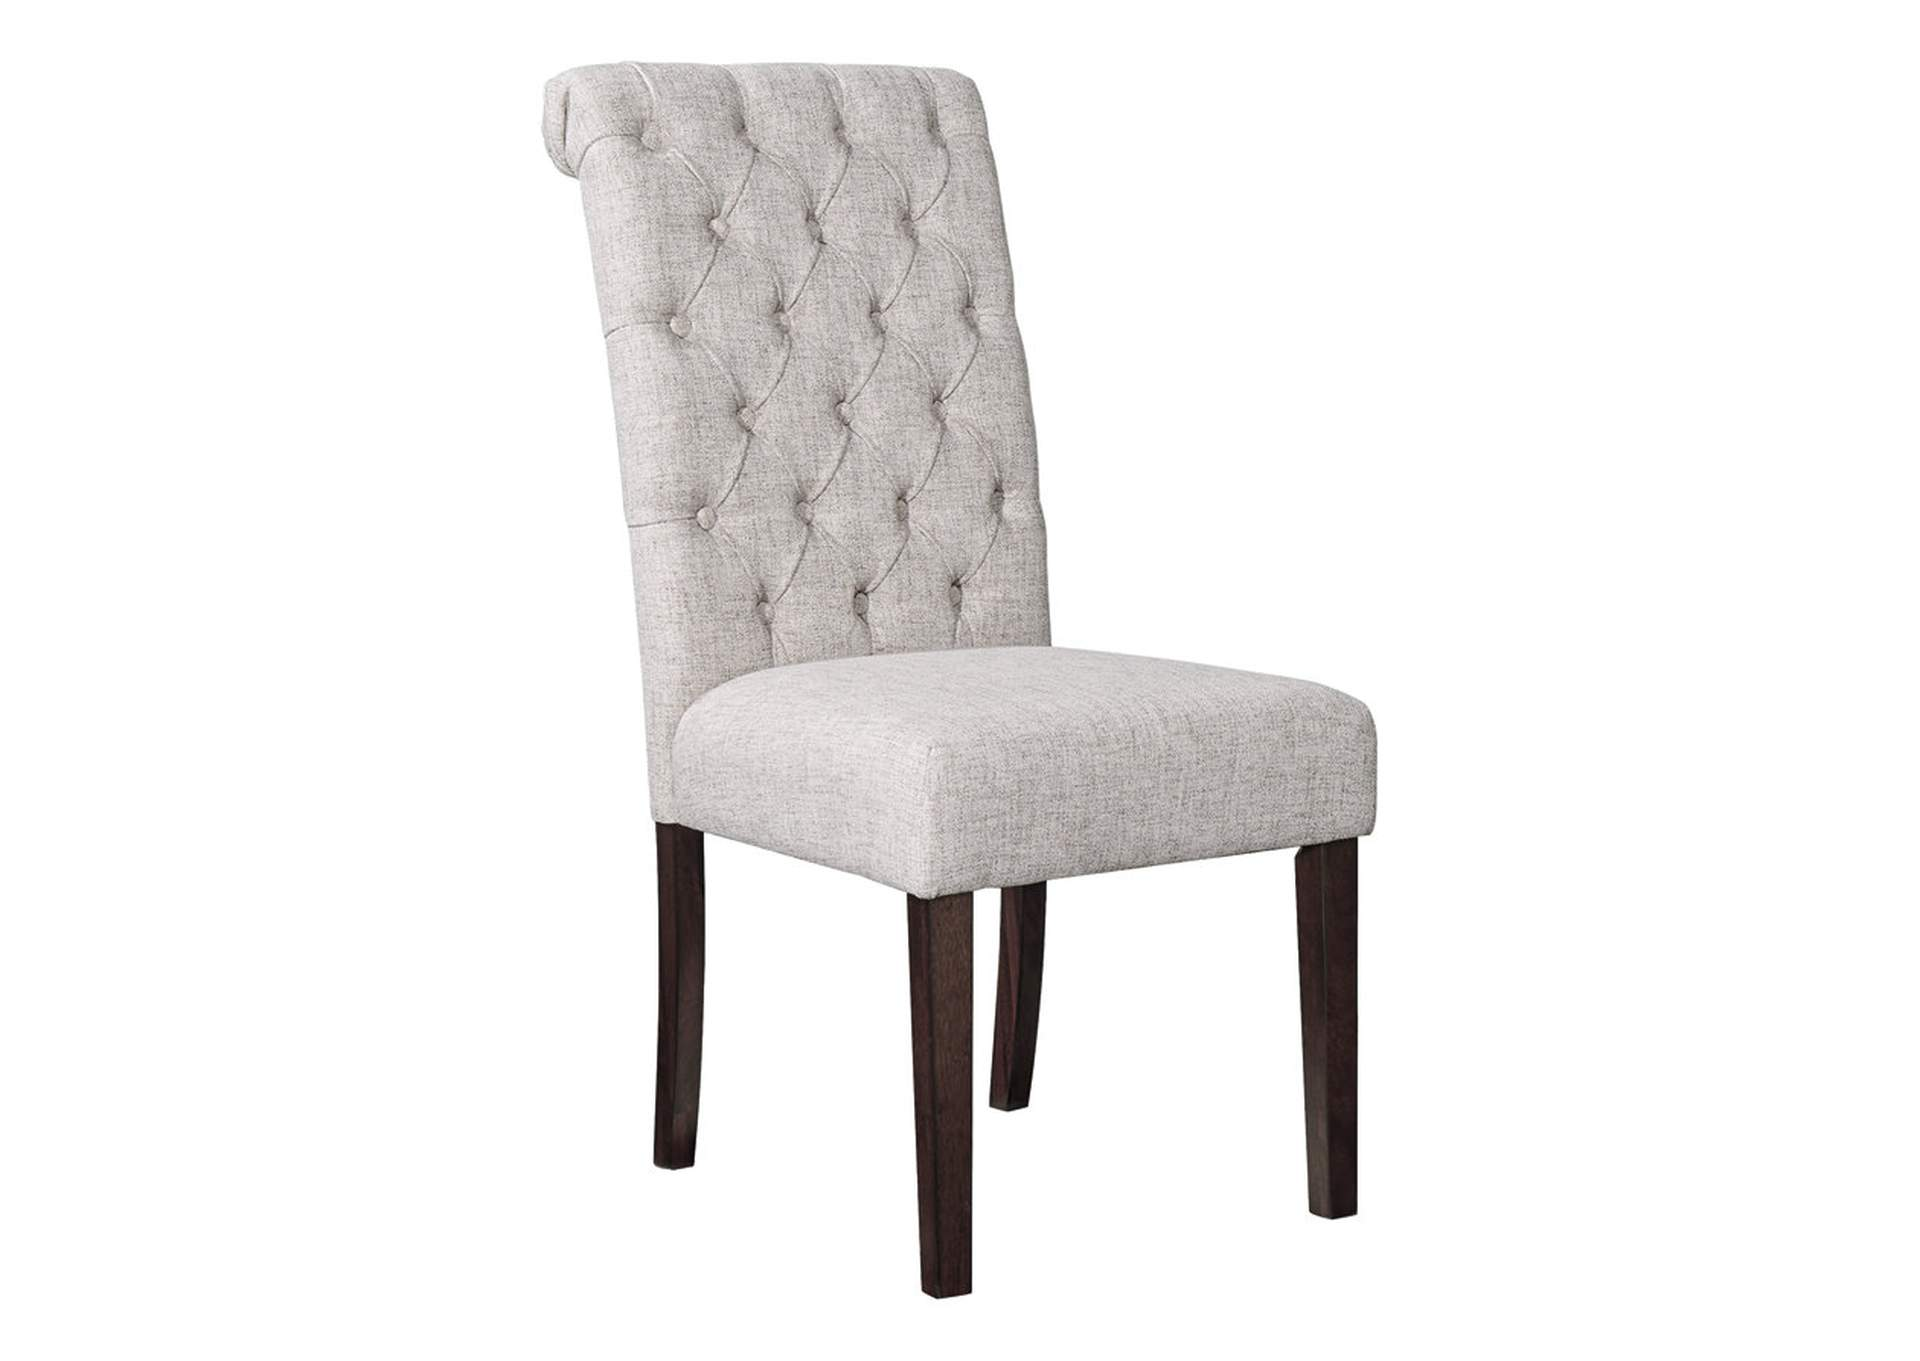 Adinton Dining Room Chair